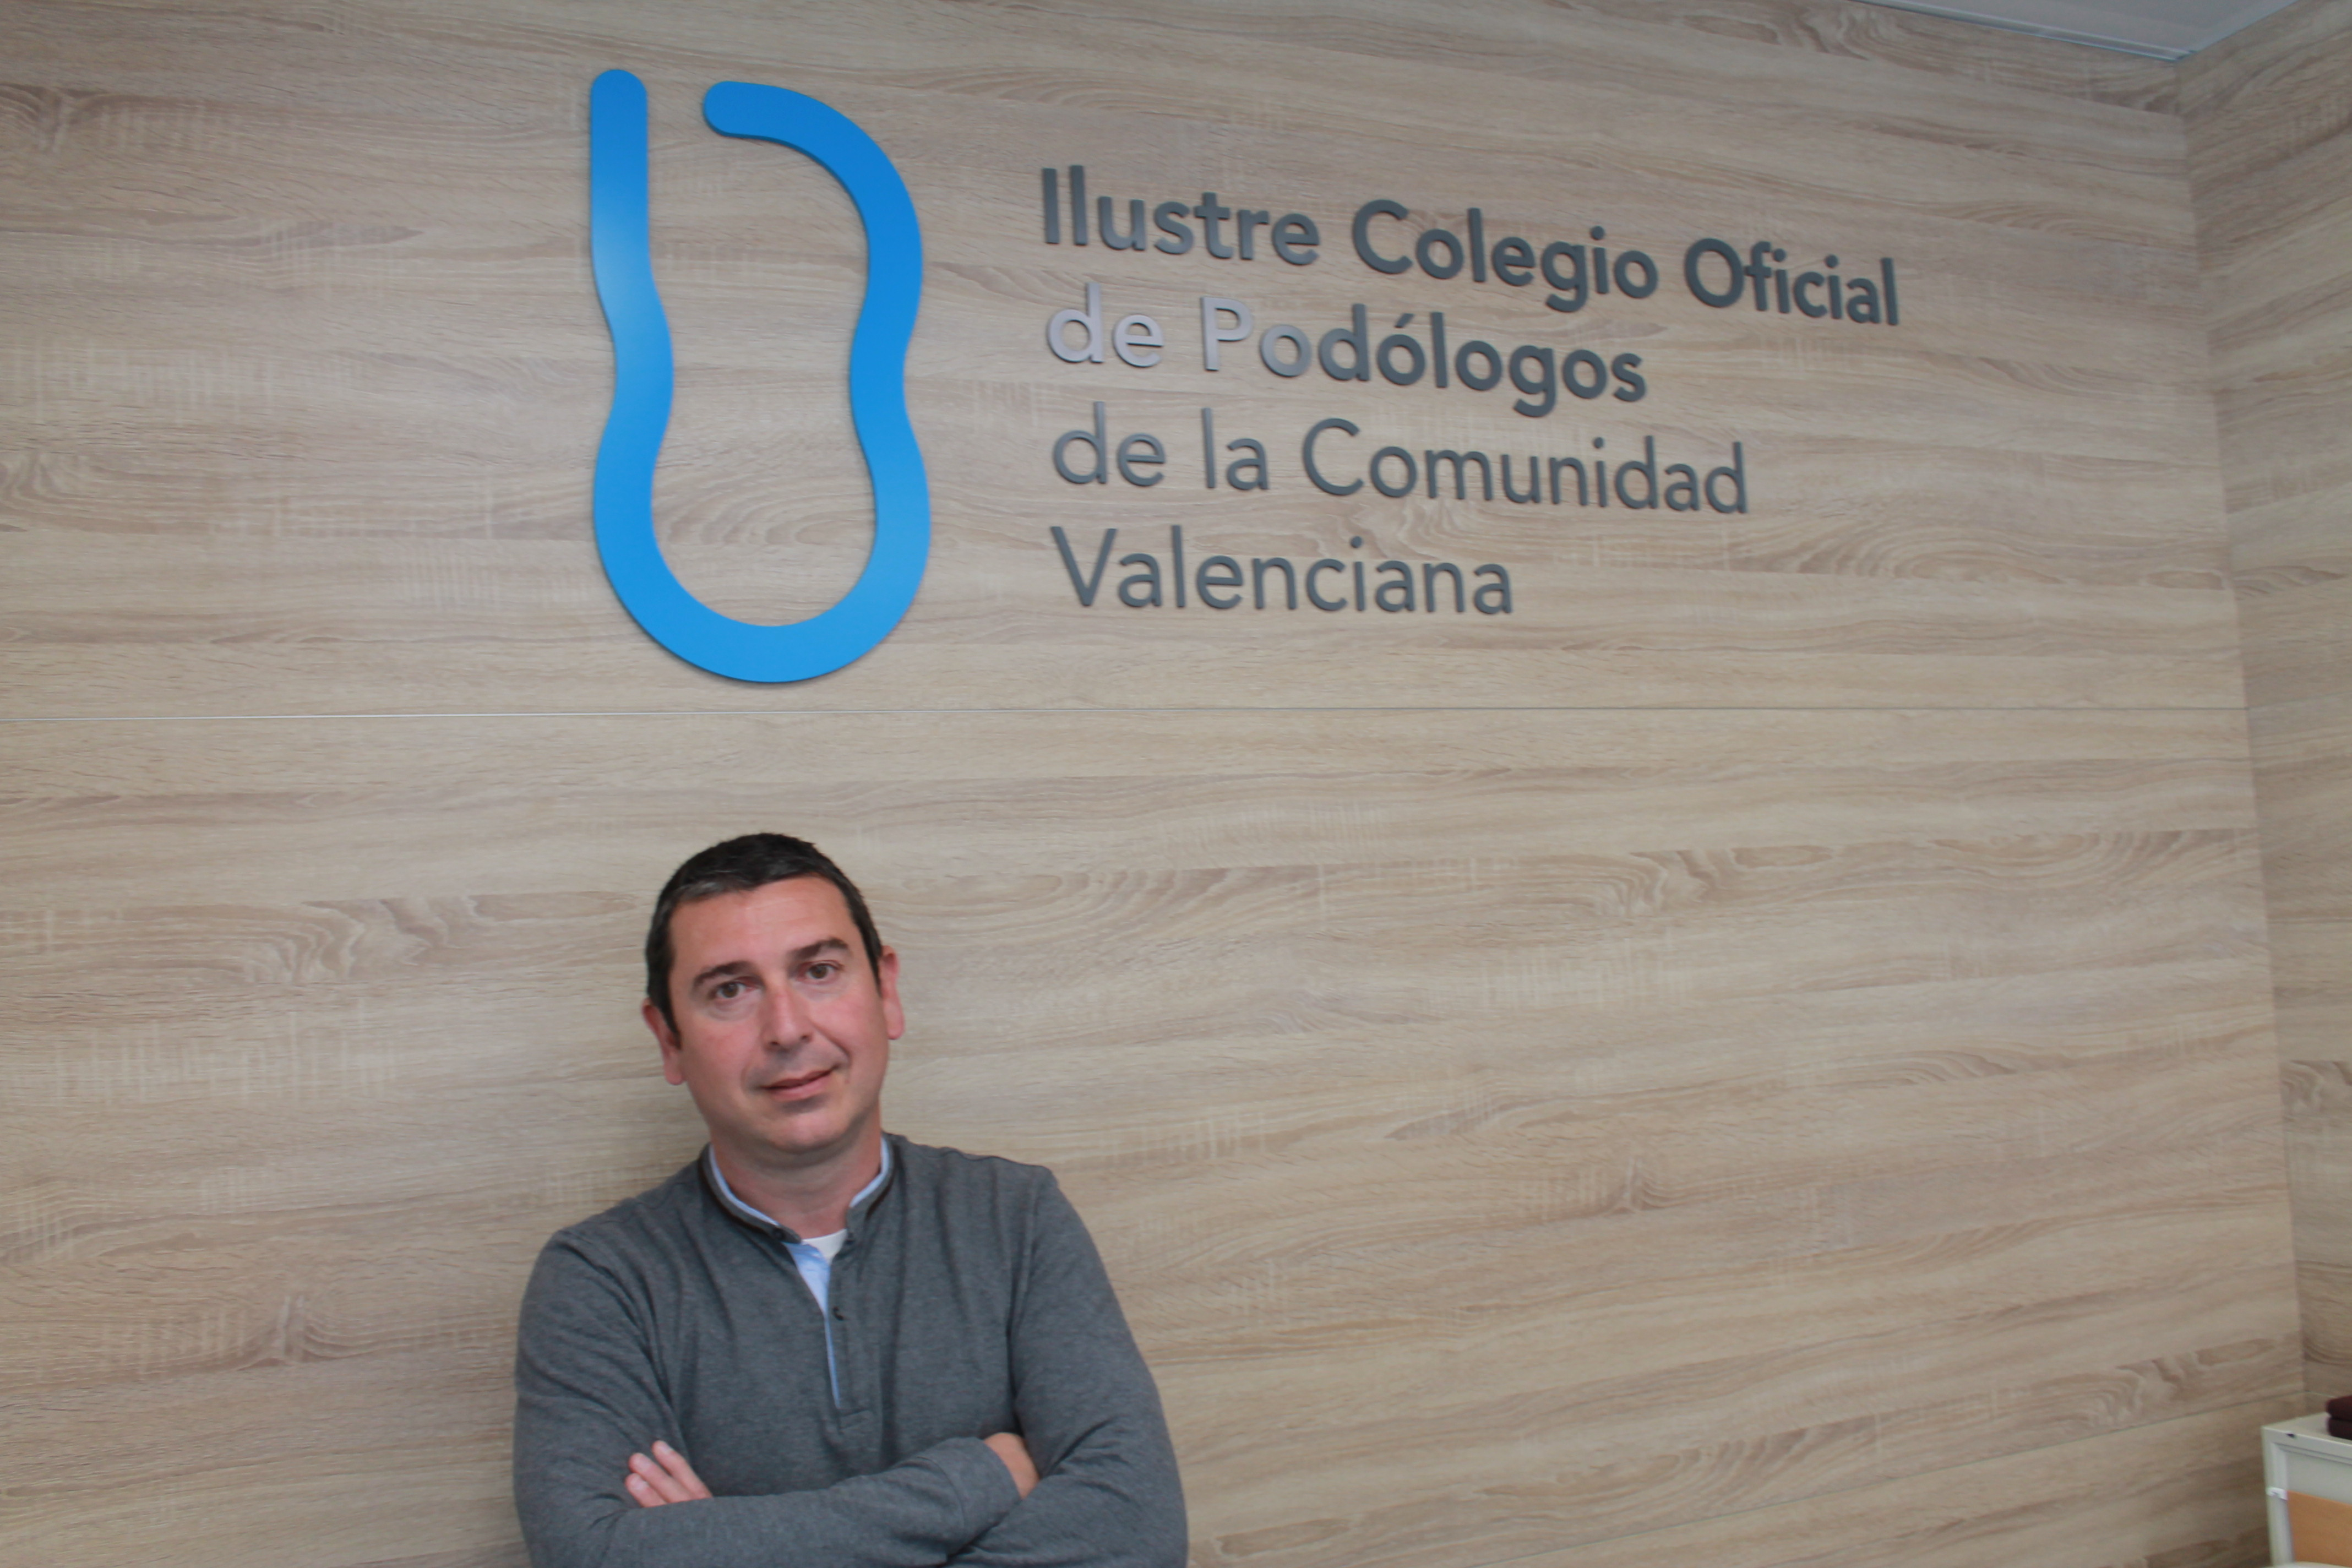 D Jorge Escoto Rosell